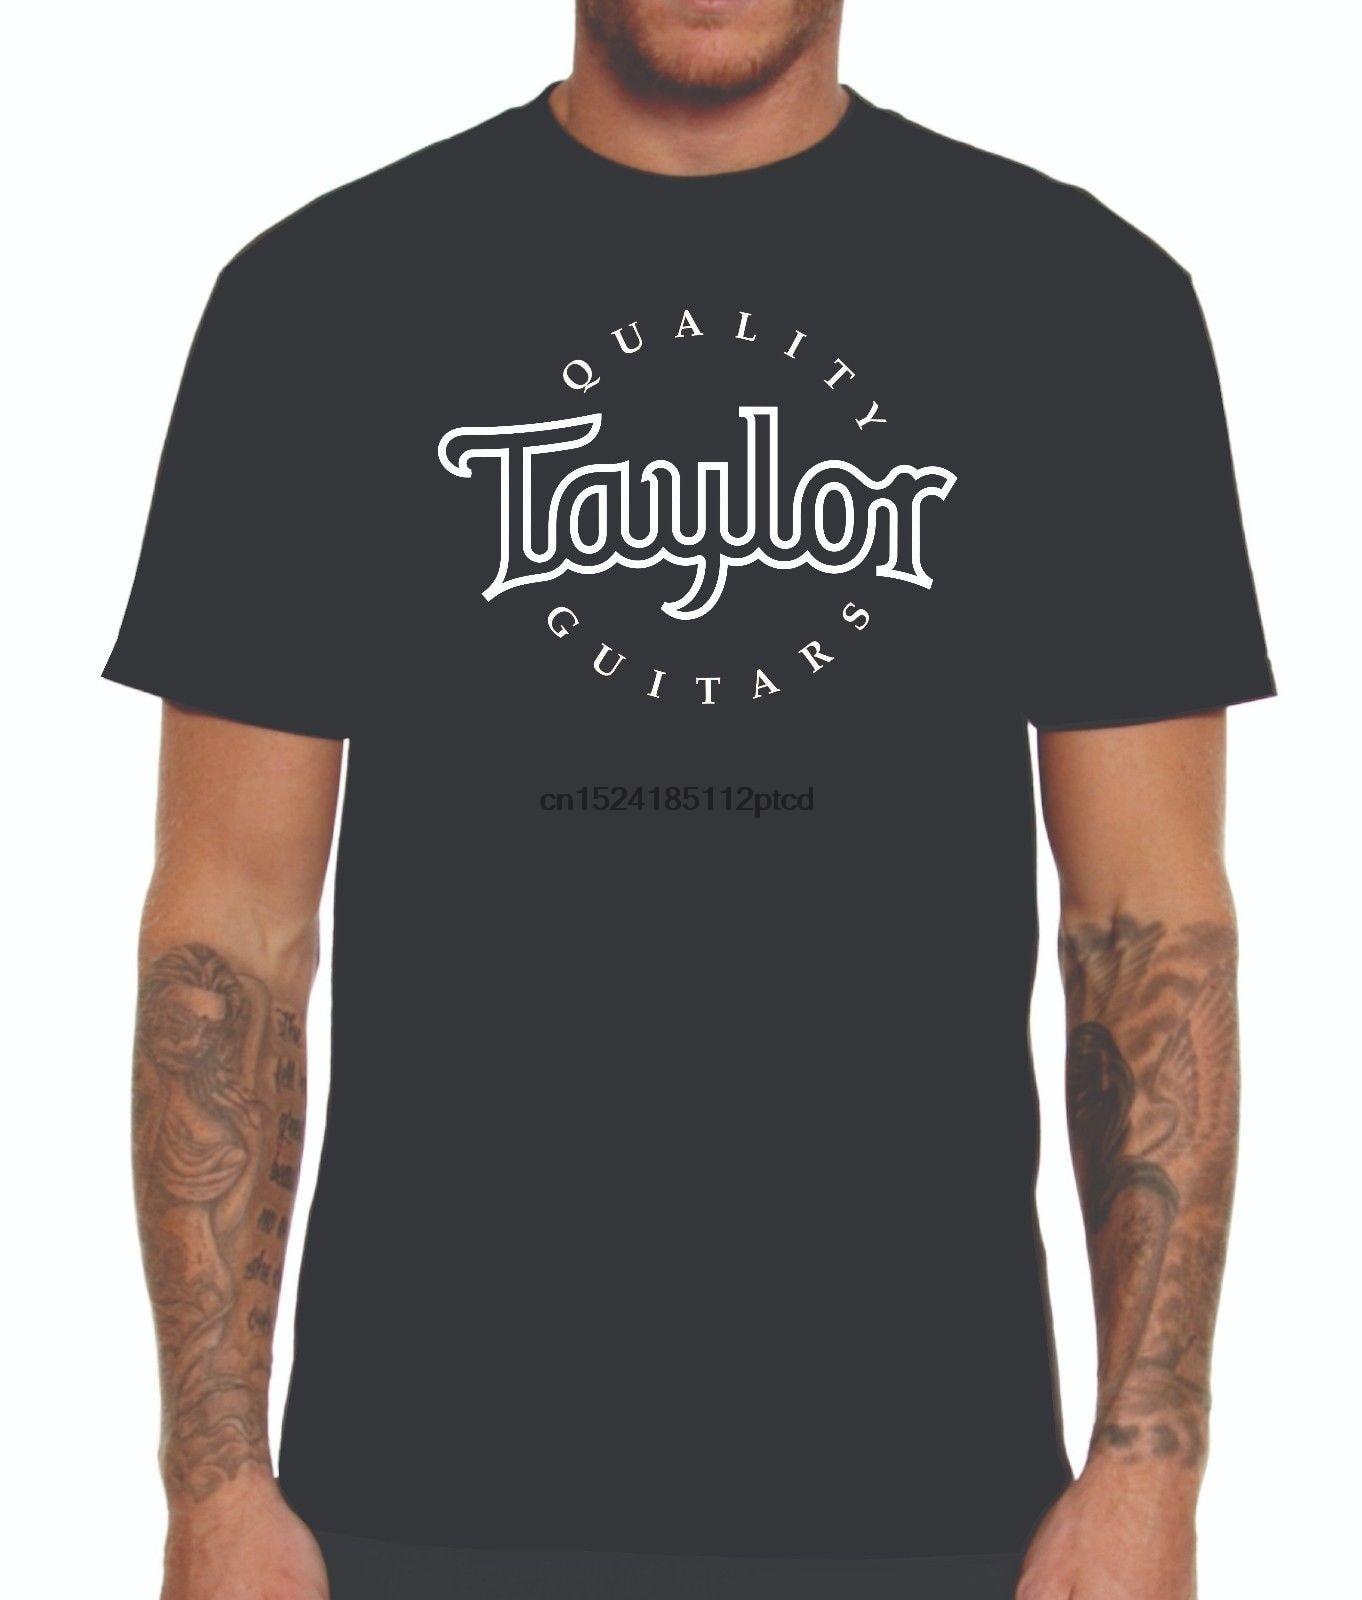 black taylor acoustic guitar shirt 12e 110e 114e 110ce 150e 214ce 210e 214ce 310 in t shirts. Black Bedroom Furniture Sets. Home Design Ideas